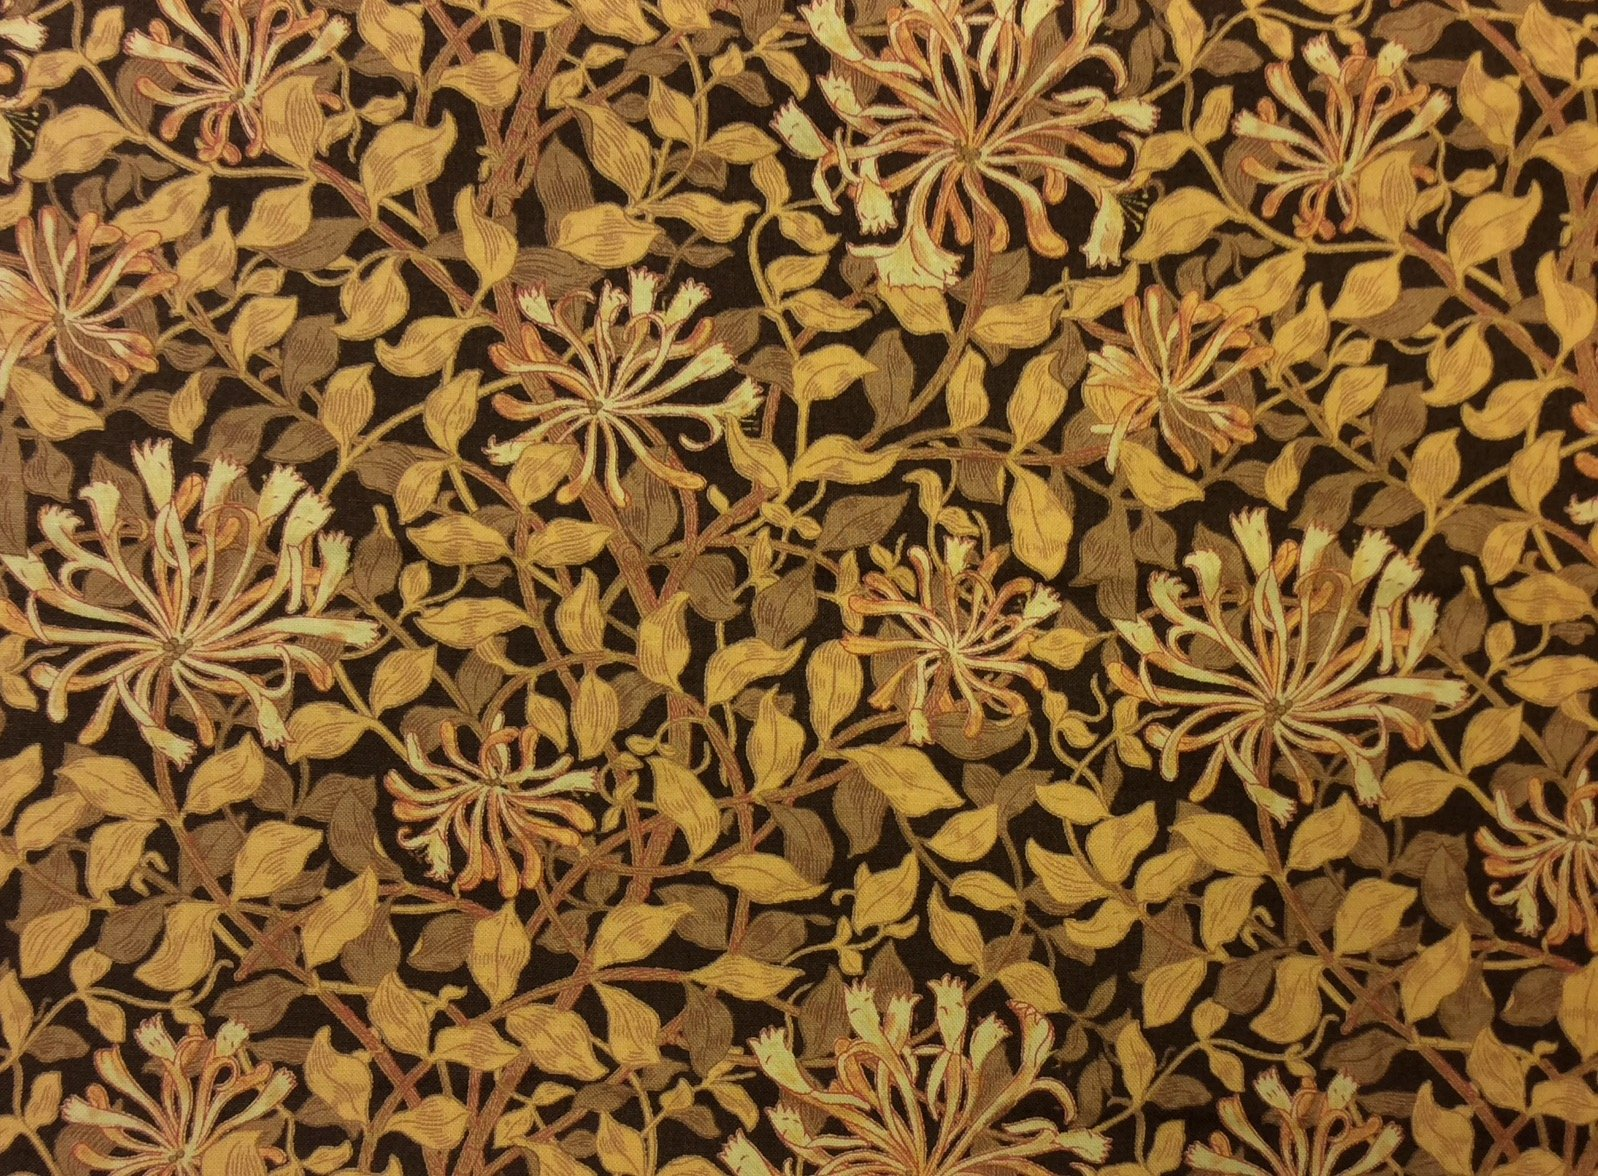 Rare! Barbara Brackman MODA Best Of Morris Flower Deco Nouveau Floral Vines Gold Leaves Cotton Quilting Fabric MO26